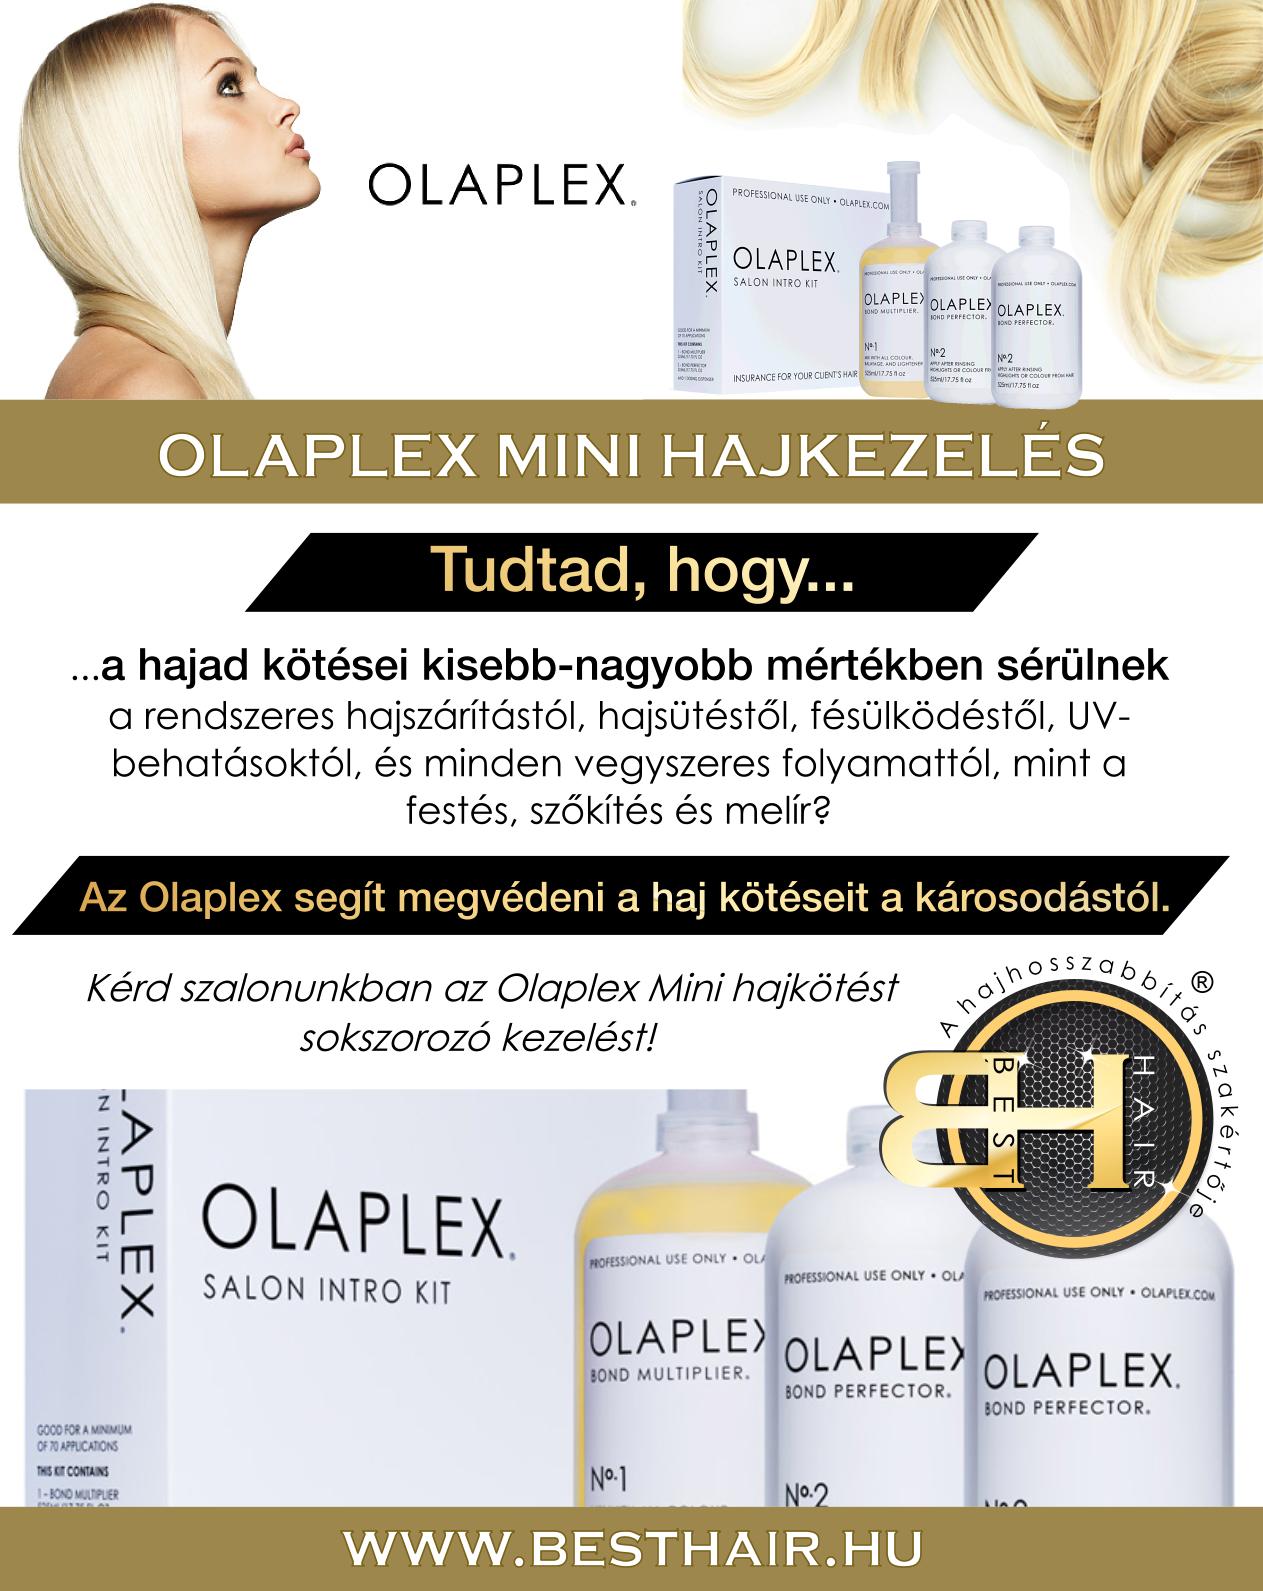 olaplex-mini-hajkezeles